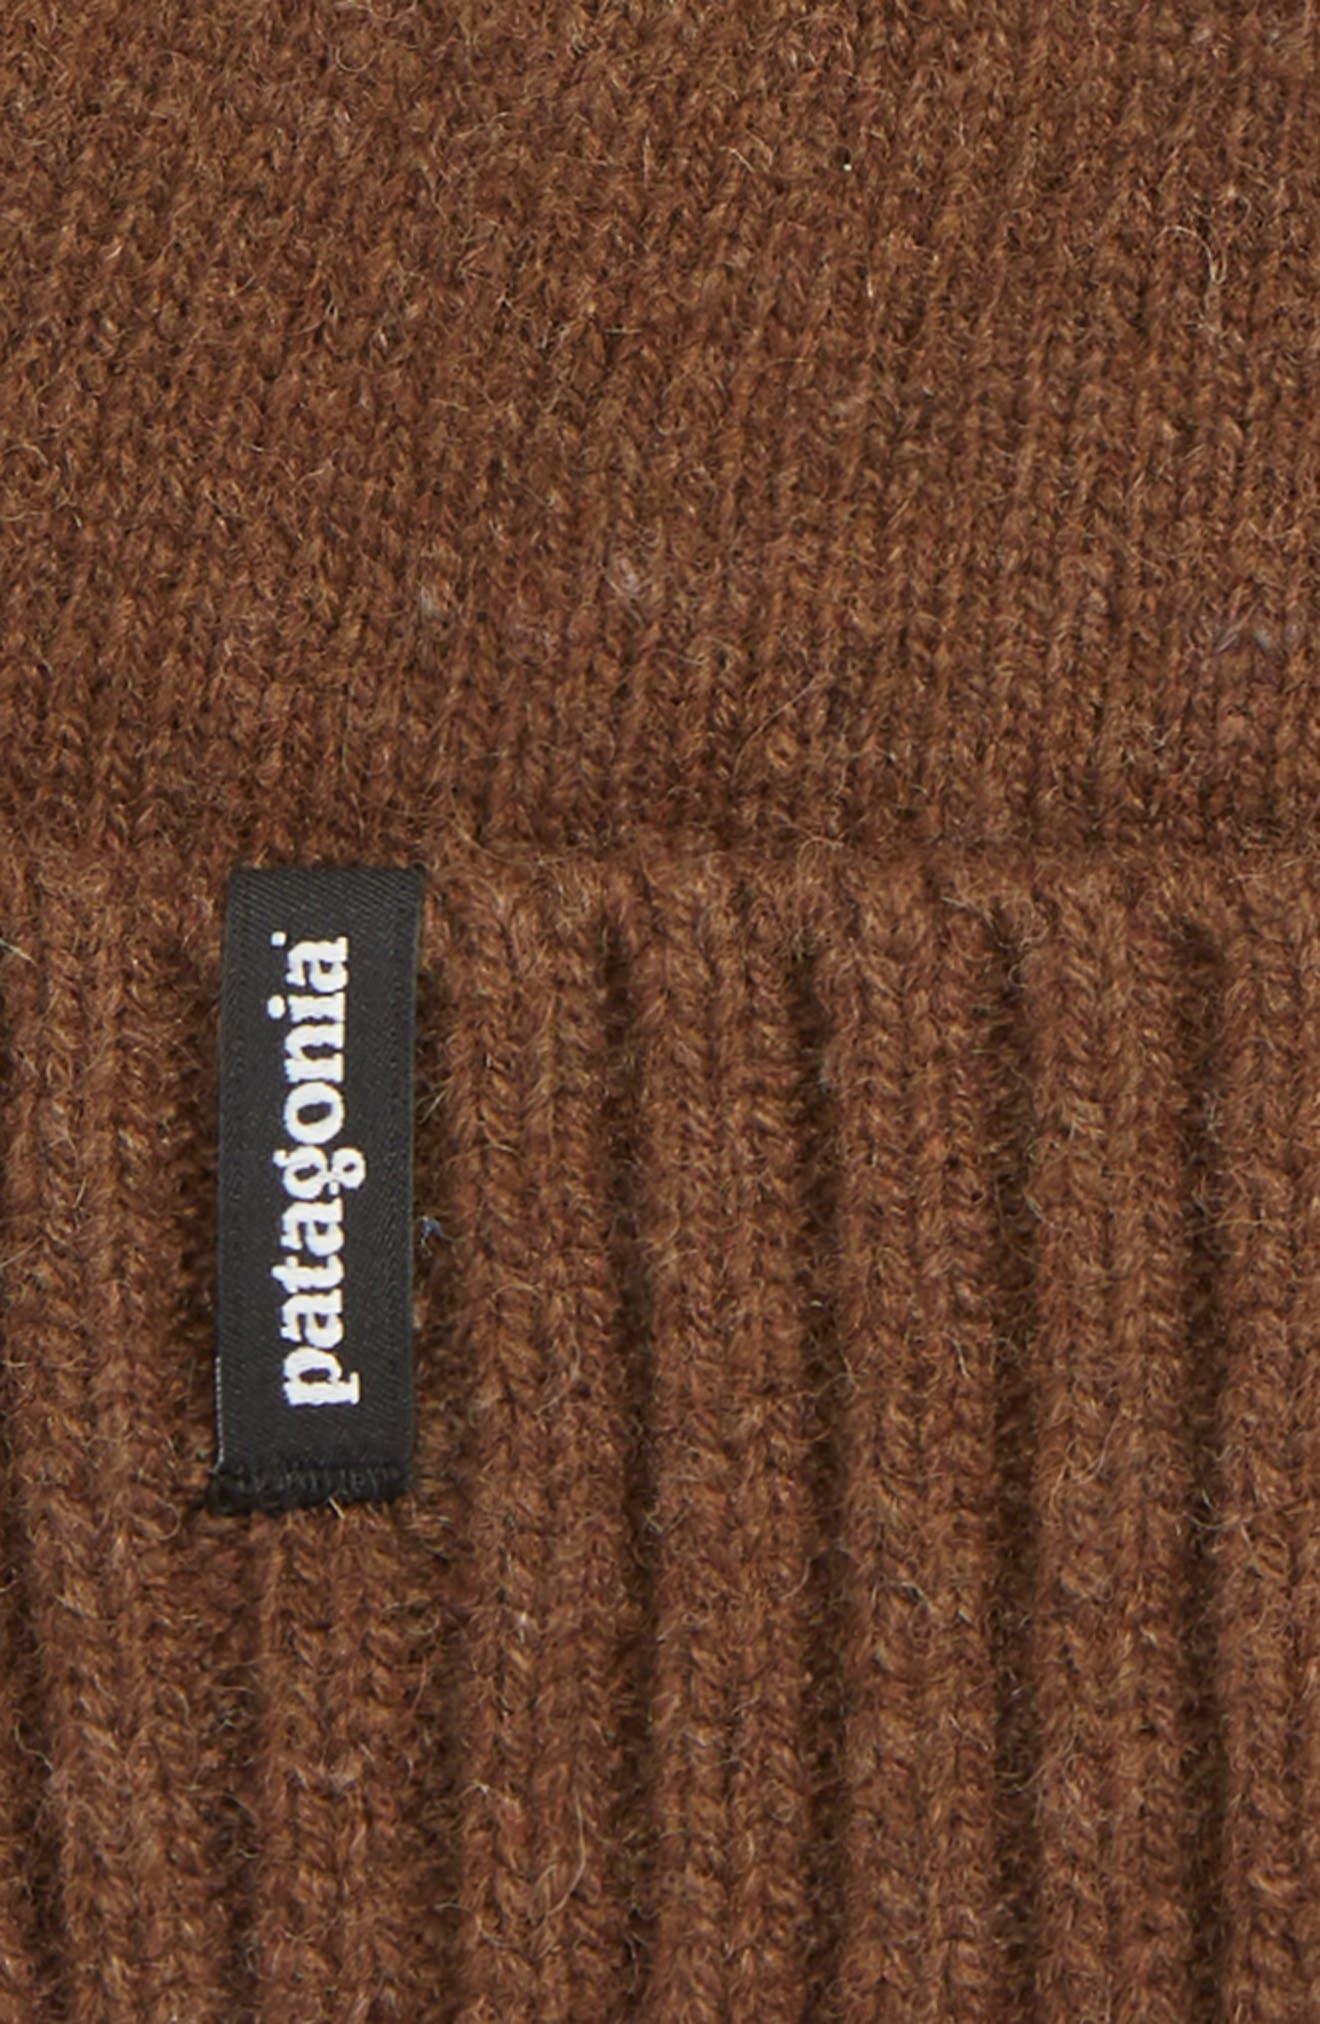 Brodeo Wool Stocking Cap,                             Alternate thumbnail 2, color,                             TIMBER BROWN